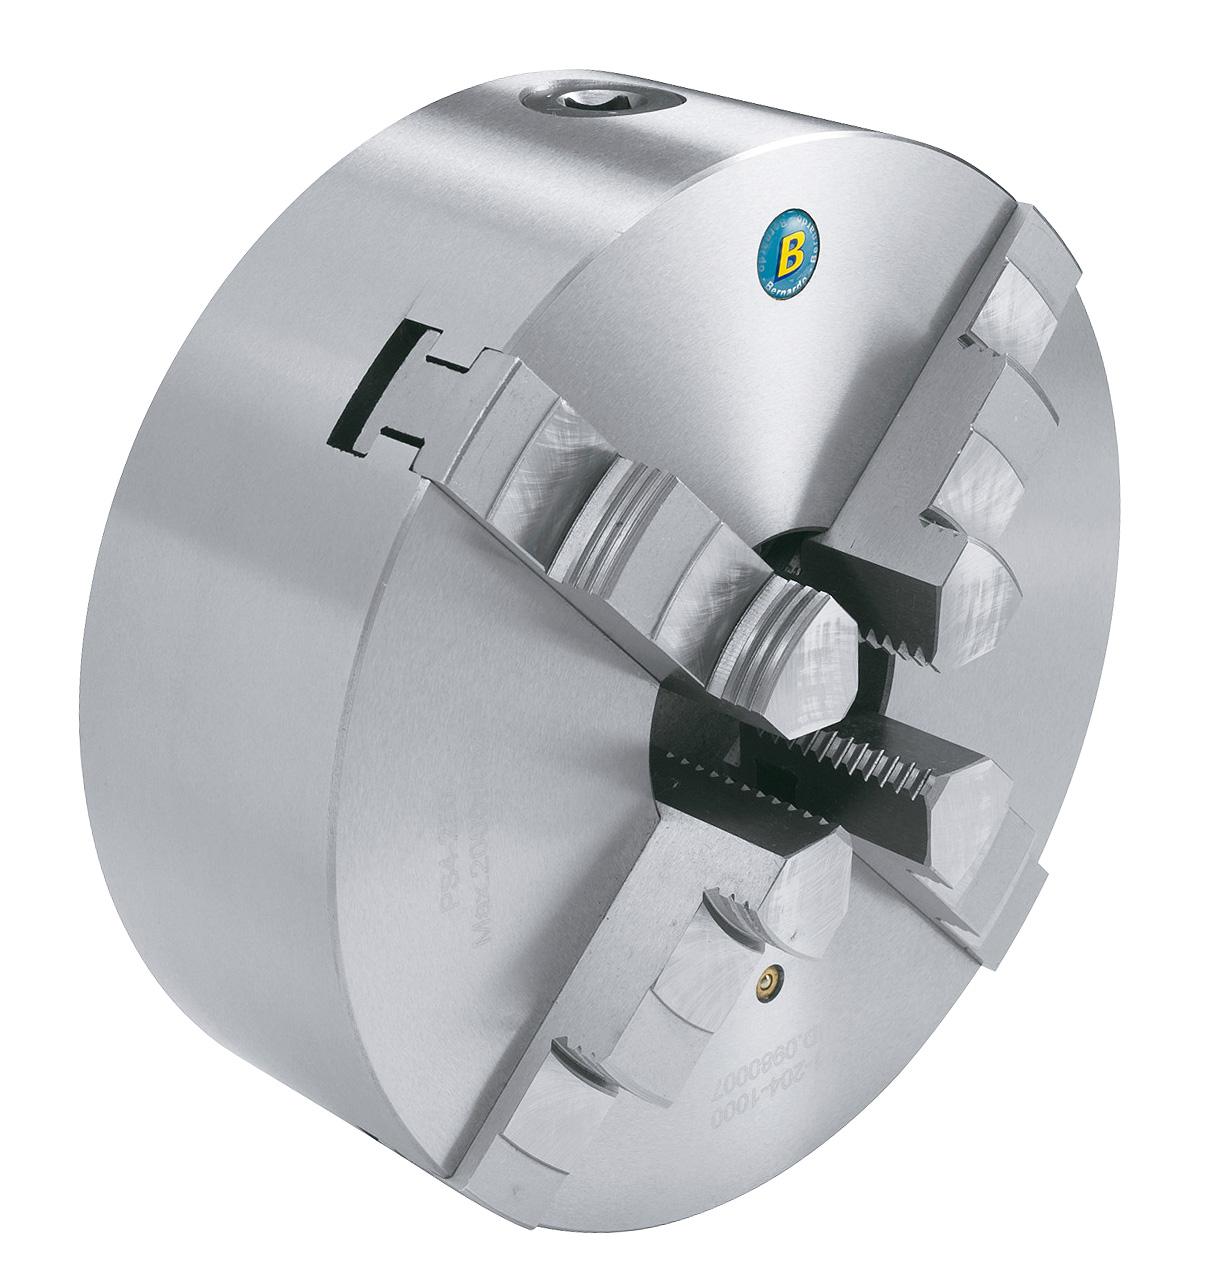 4 bakket centrerpatron standard DK12-400